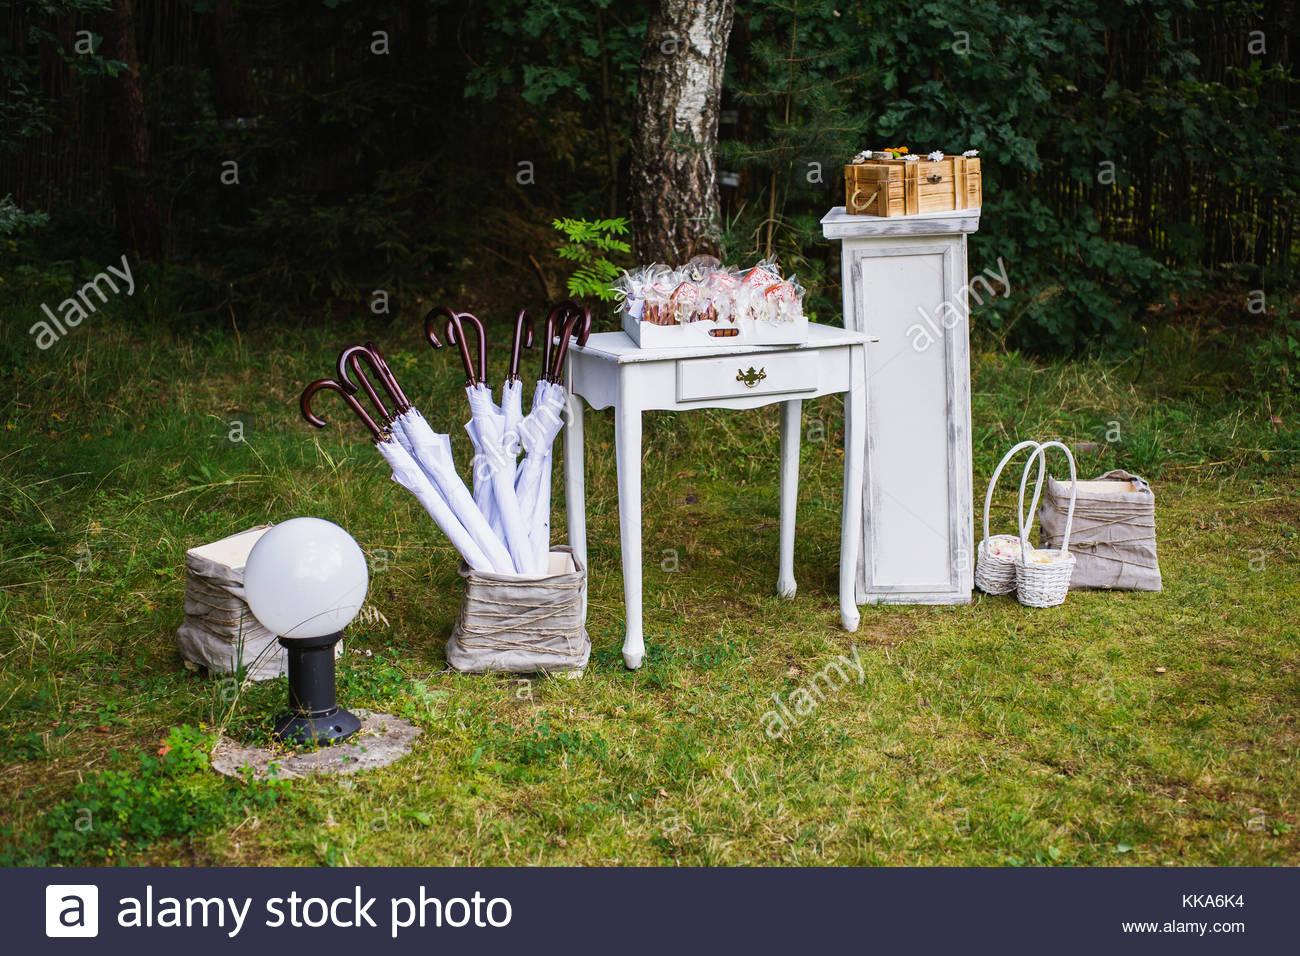 Beautiful unusual wedding decor rustic style umbrellas gift boxes beautiful unusual wedding decor rustic style umbrellas gift boxes baskets with gifts table junglespirit Choice Image